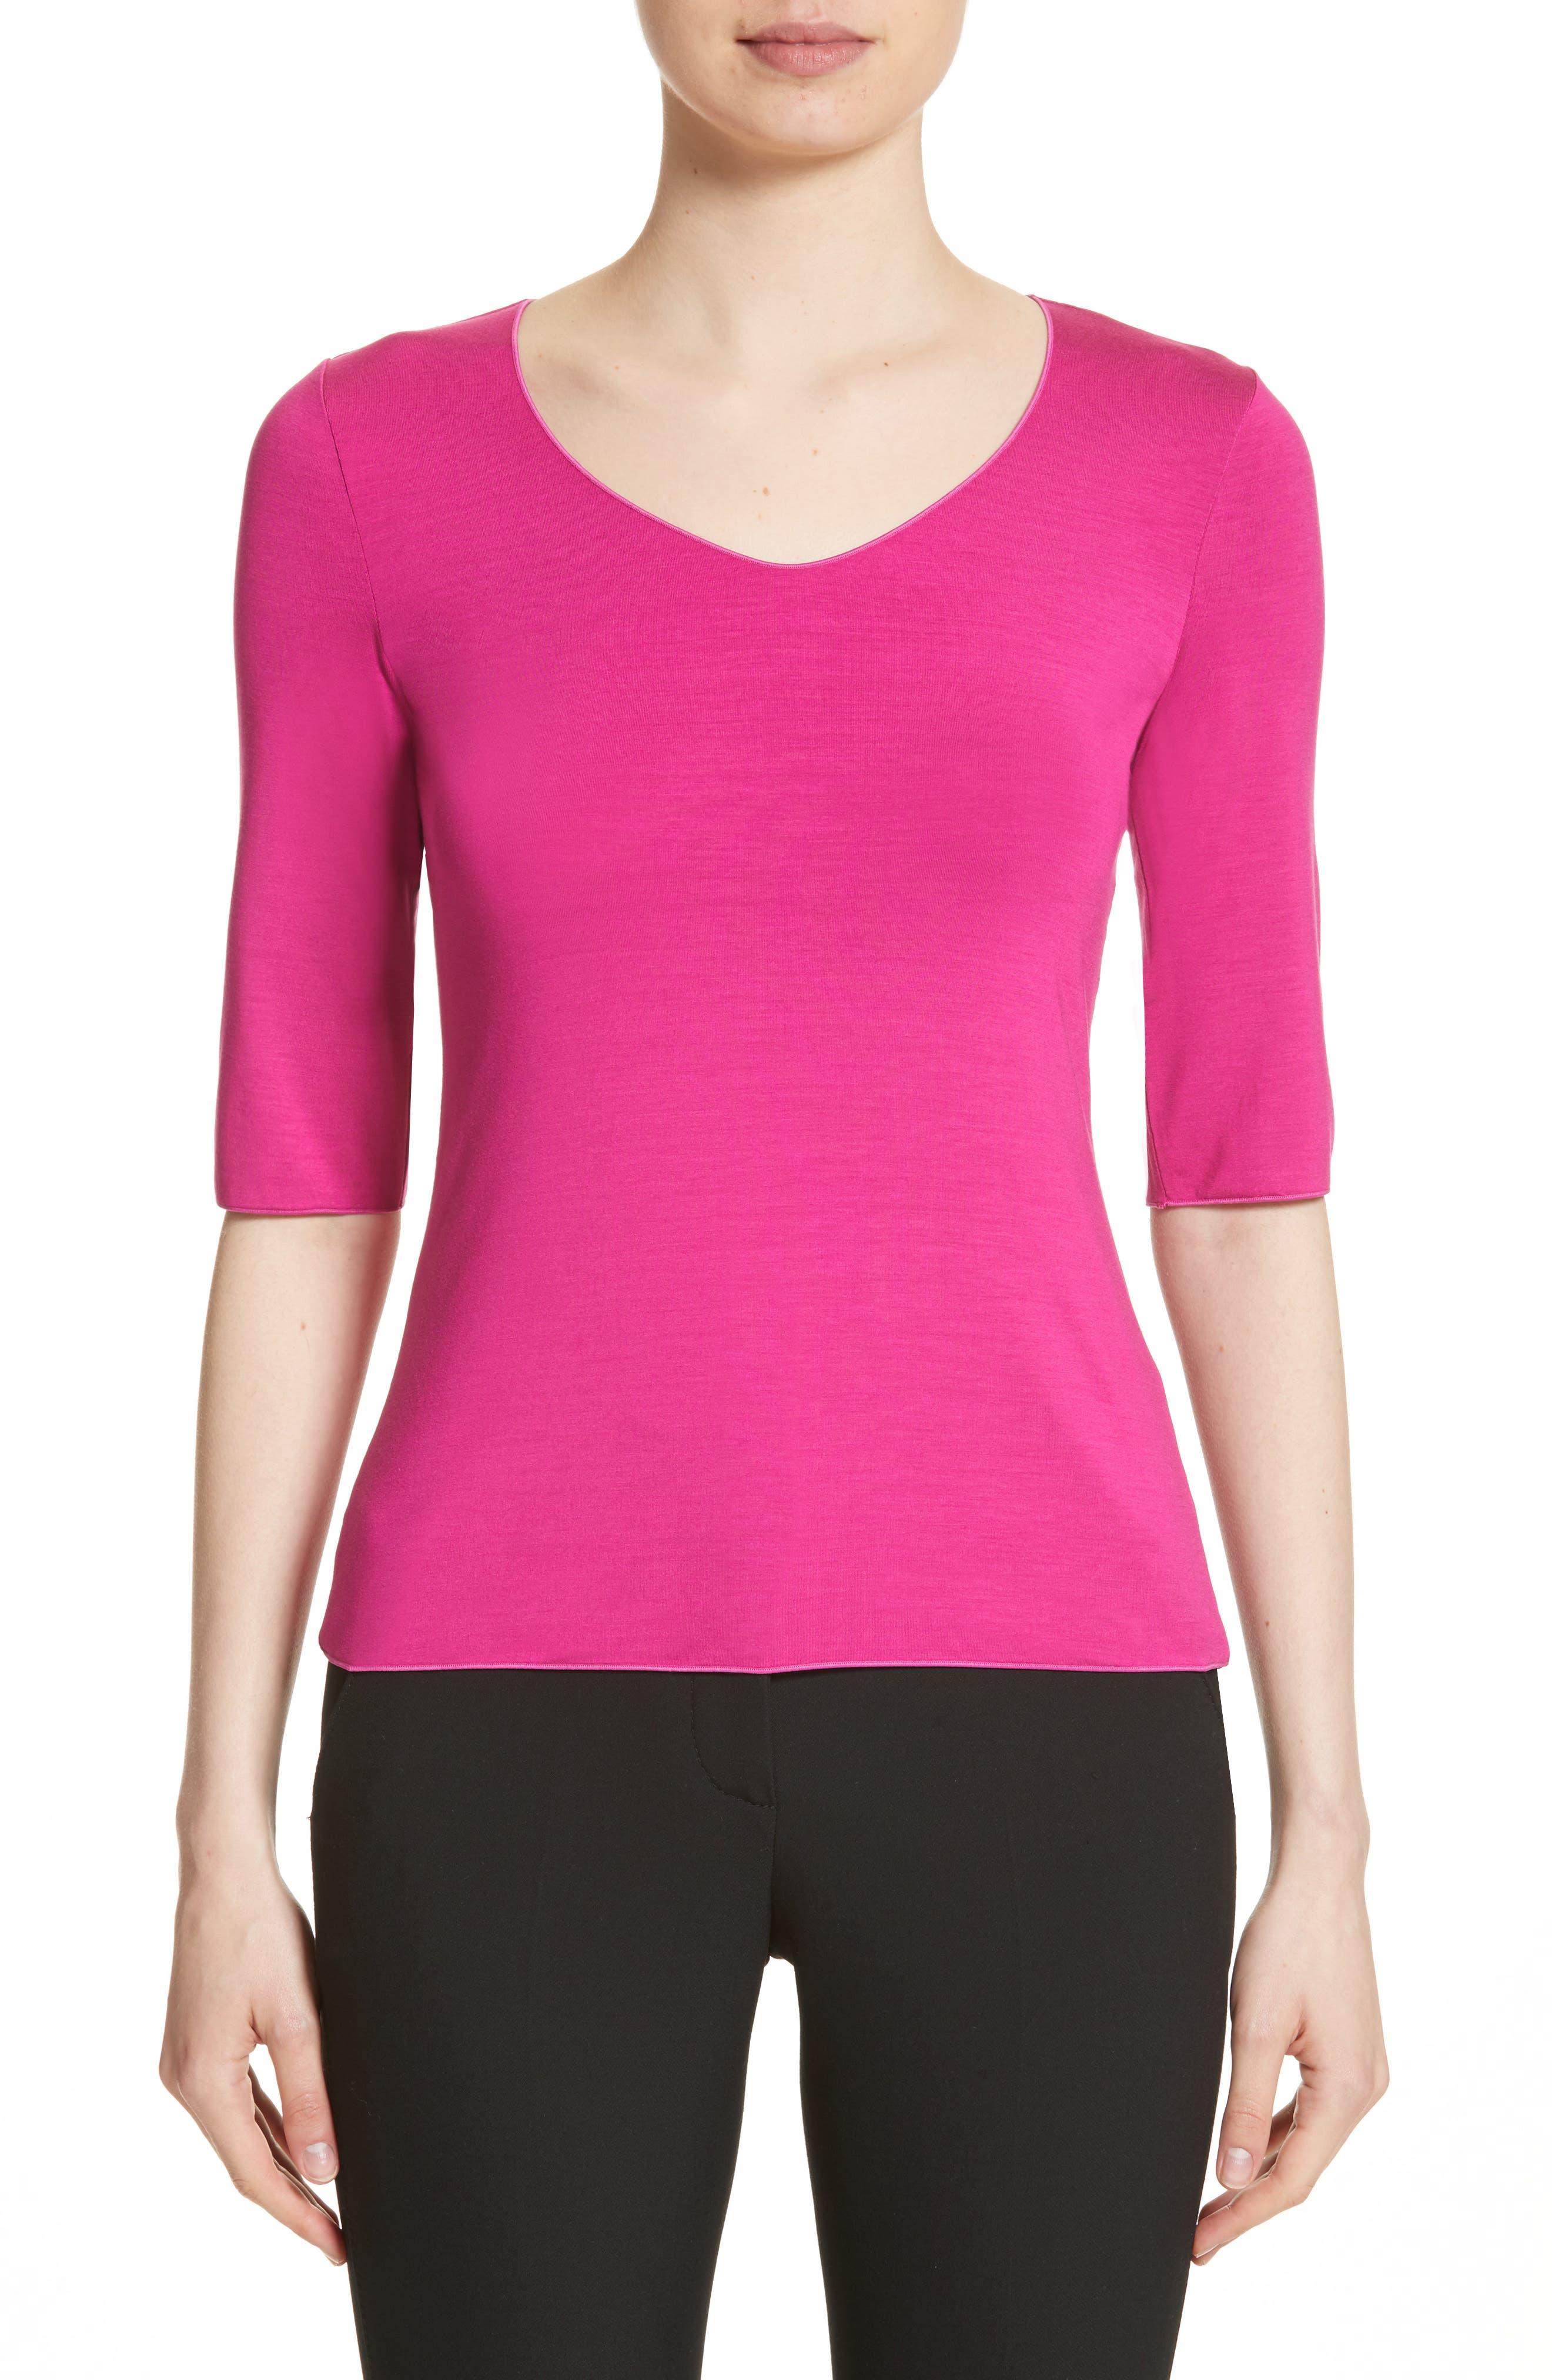 Alternate Image 1 Selected - Armani Collezioni Stretch Jersey Top